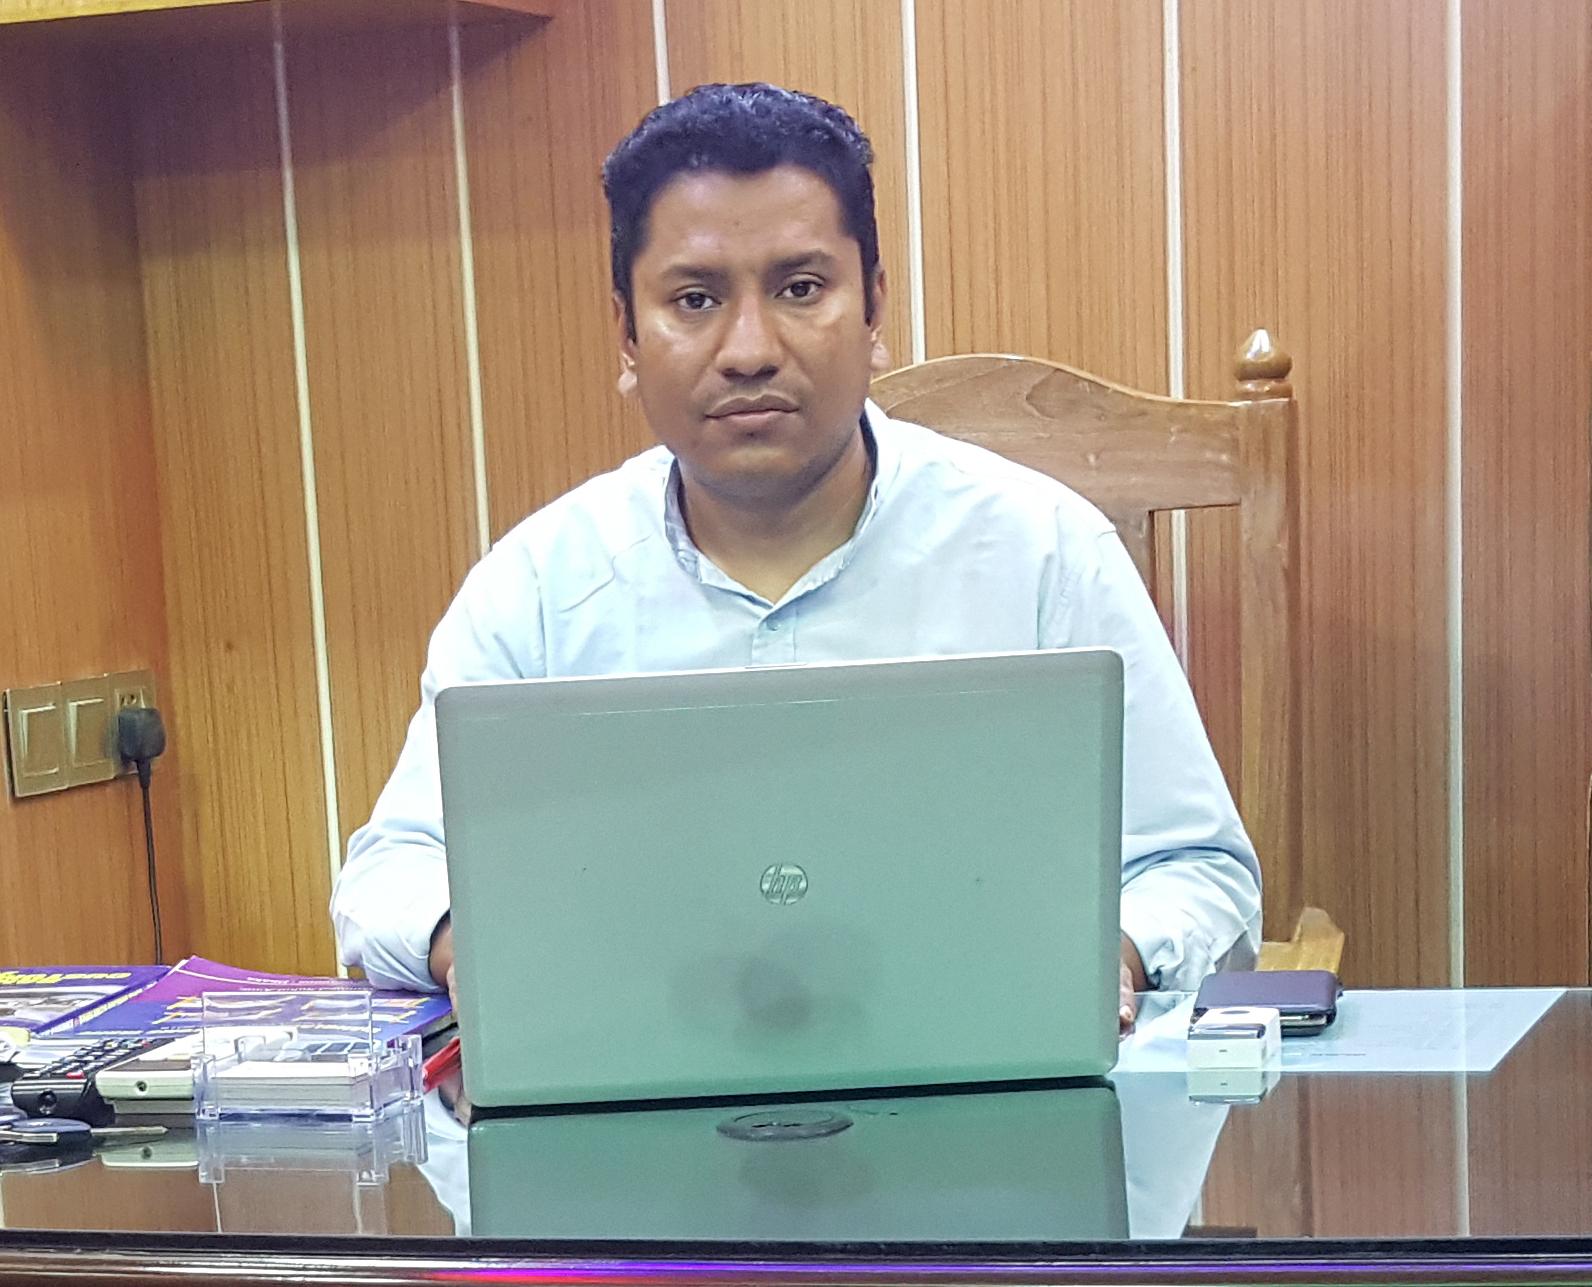 toshiba-photocopier-machine-importer-wholesaler-retailer-motijheel-dhaka-bangladesh